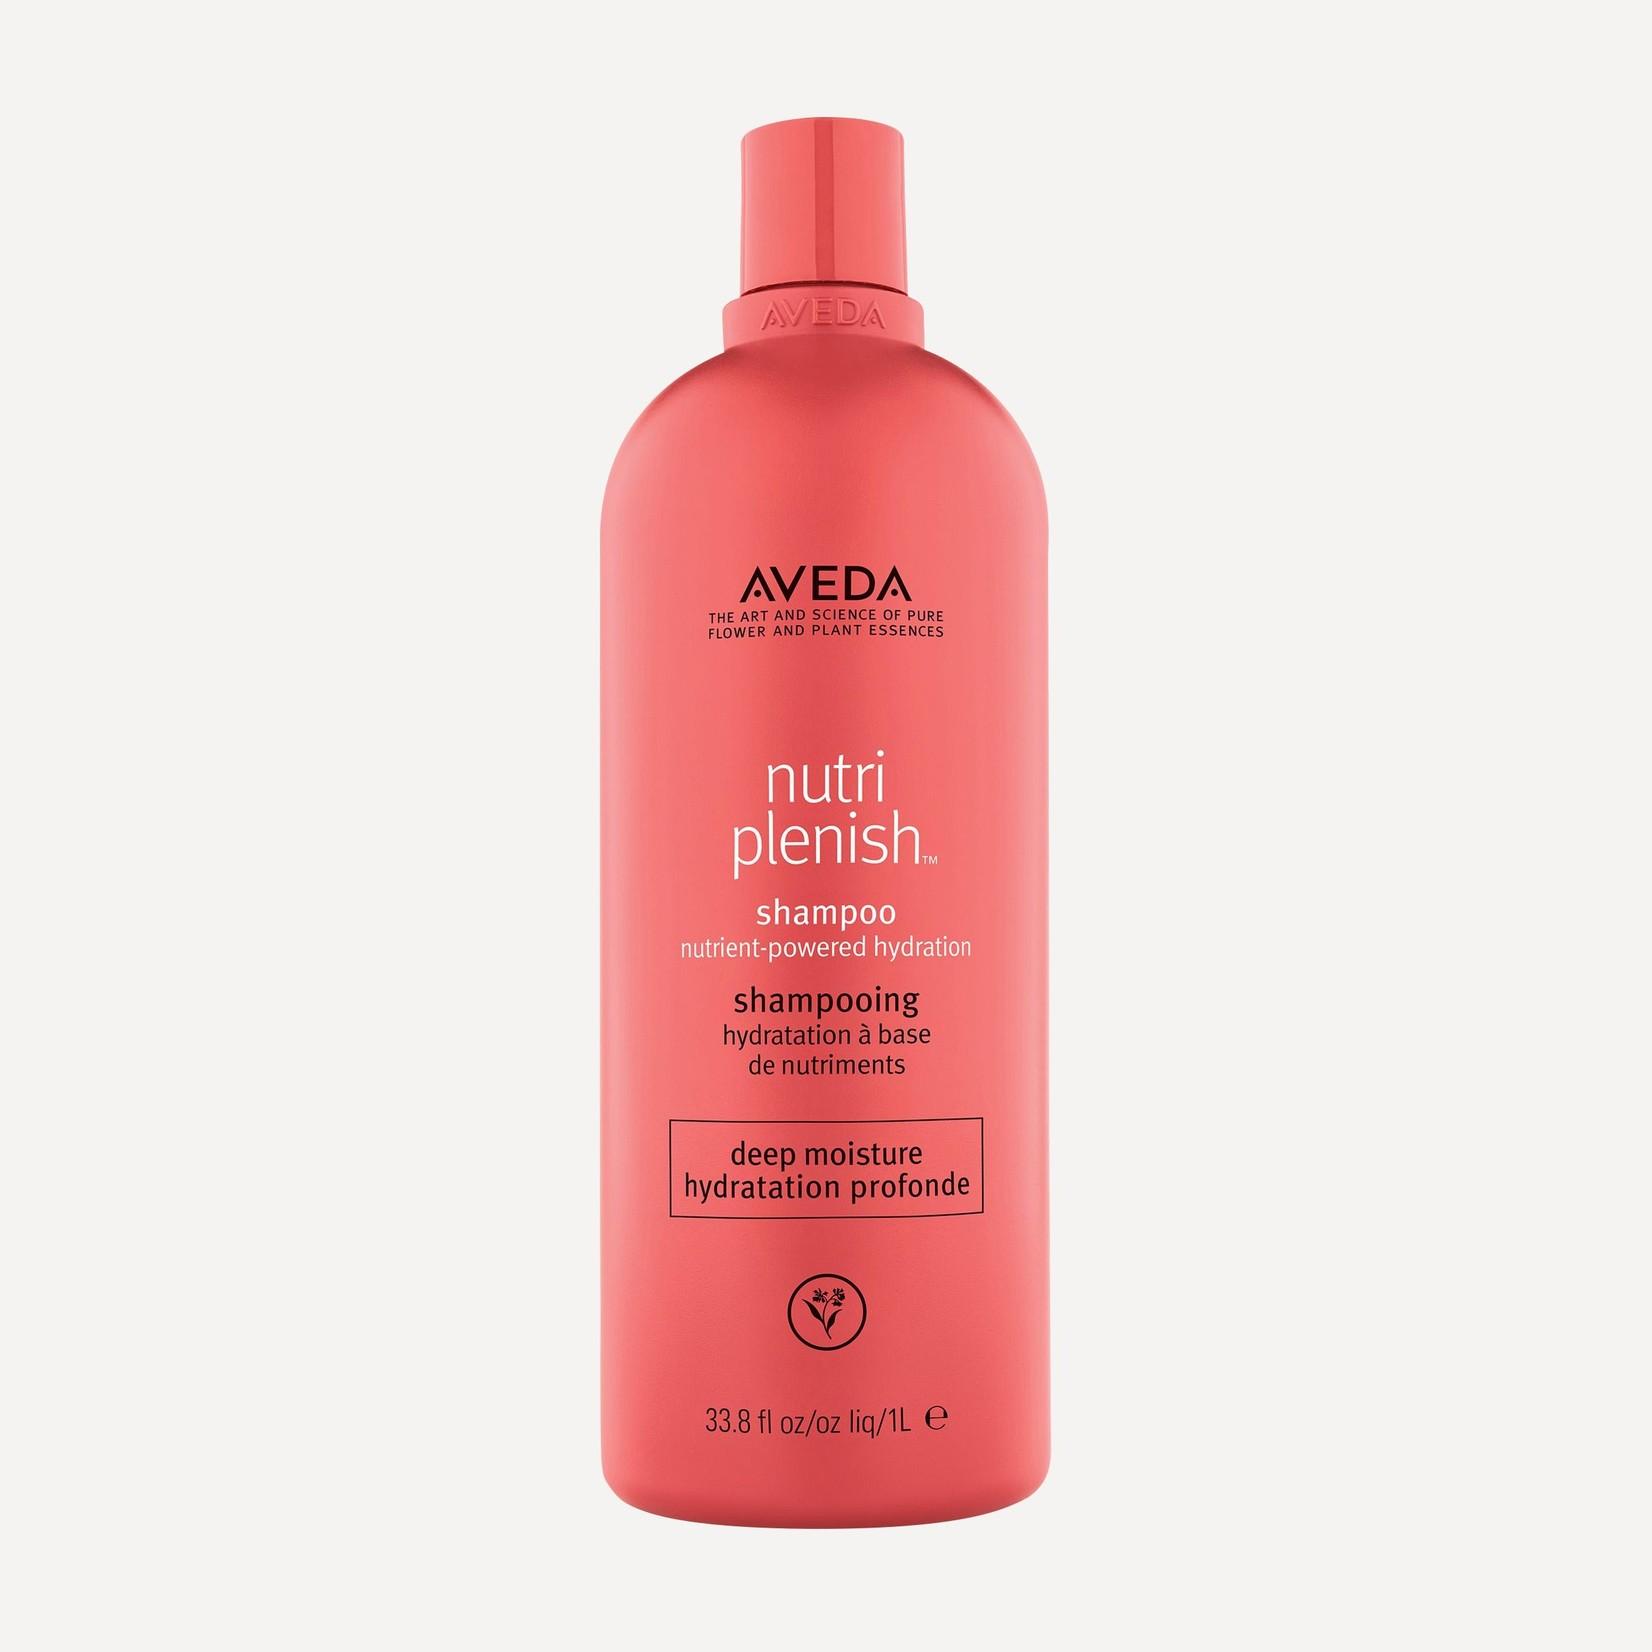 AVEDA Nutriplenish™ Shampoo Deep Moisture